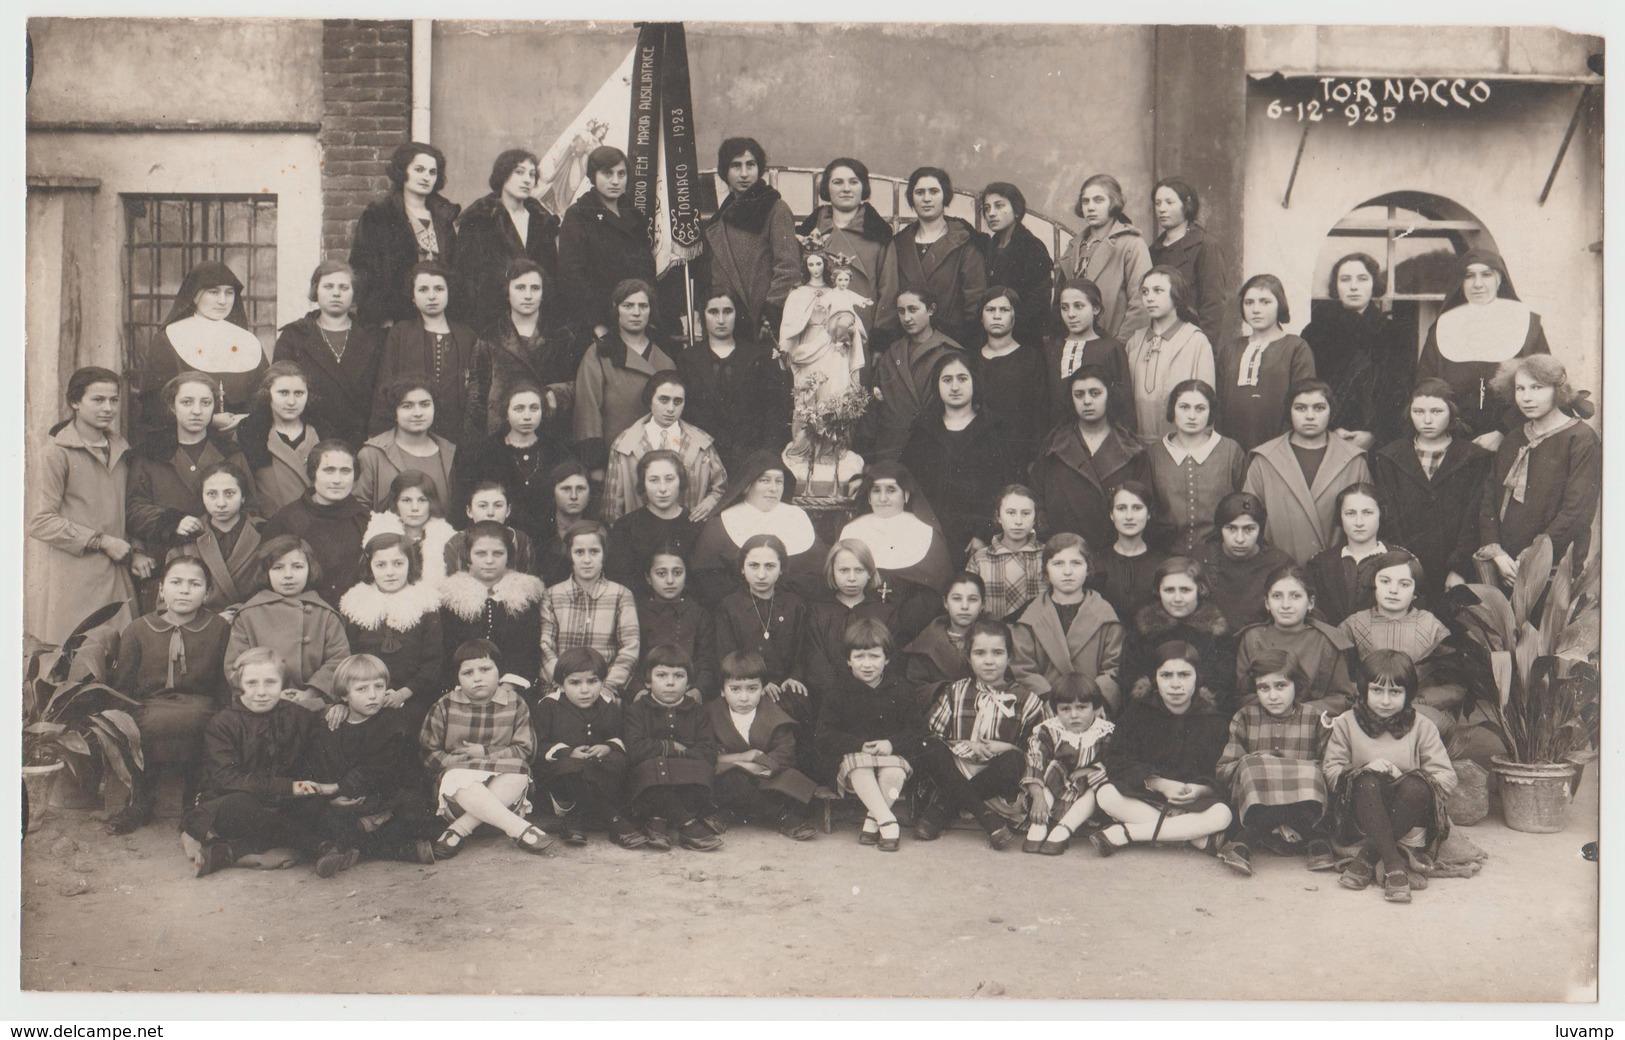 TORNACO (NOVARA) -FOTO ORIGINALE ORATORIO FEMMINILE 6 DIC. 1925 (50119) - Persone Identificate